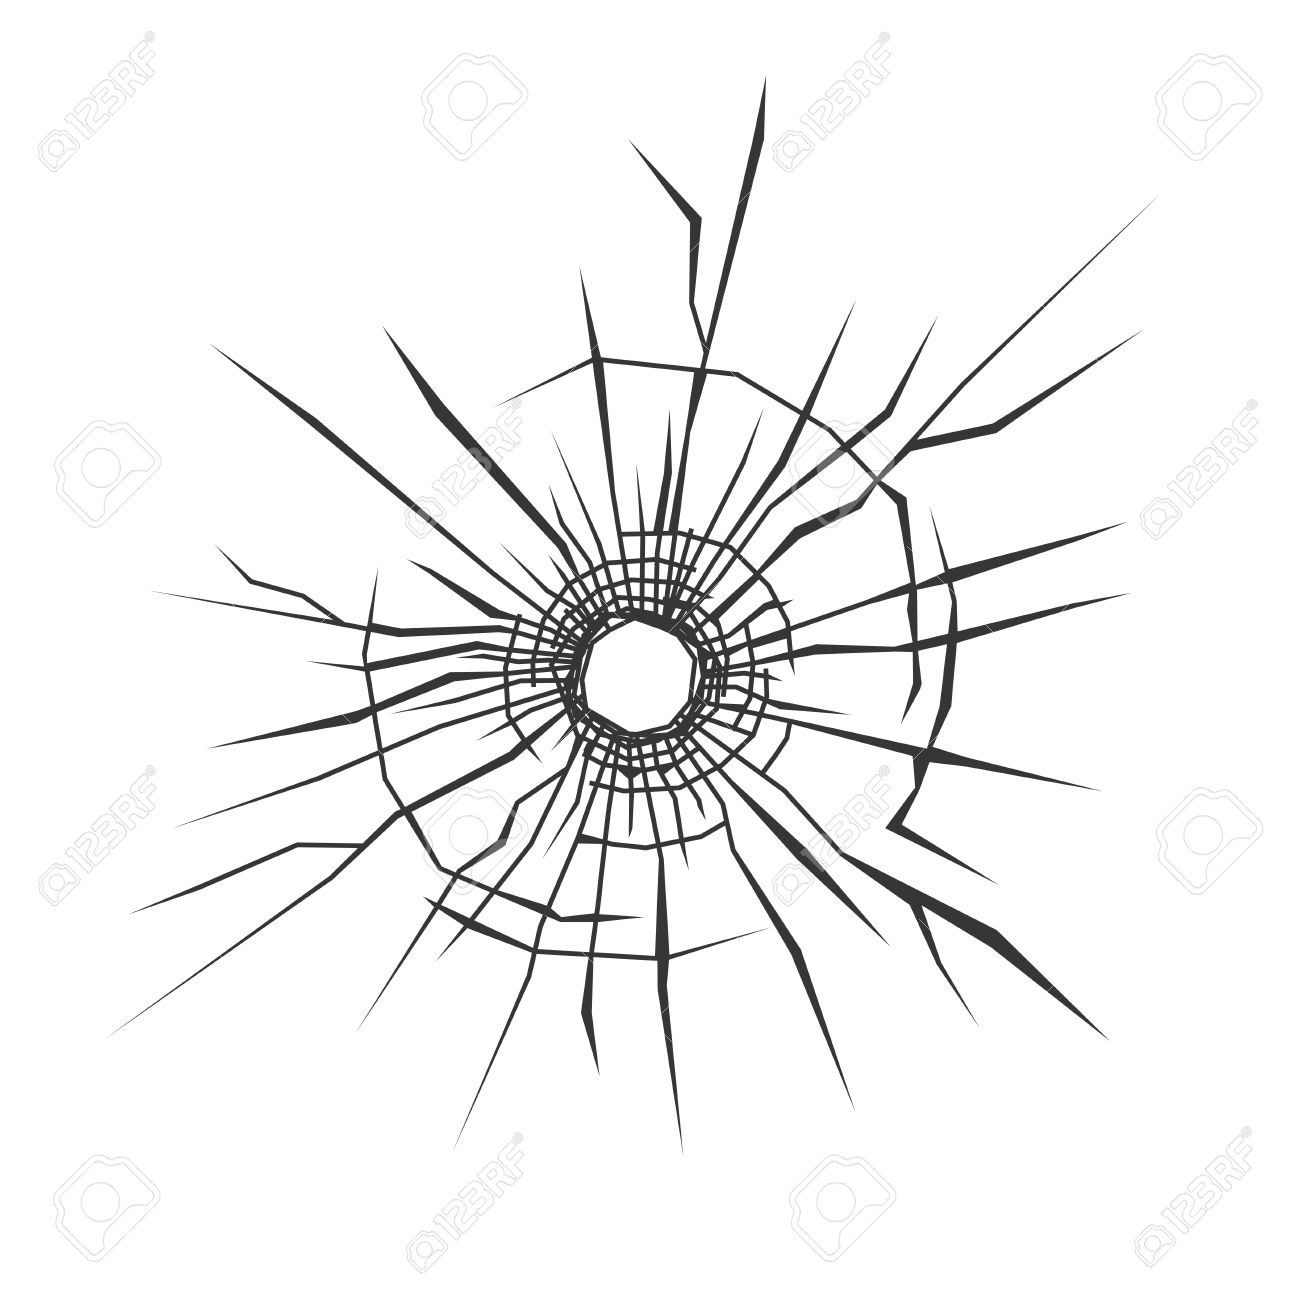 1300x1300 Bullet Hole Drawing Drawn Bullet Bullet Hole